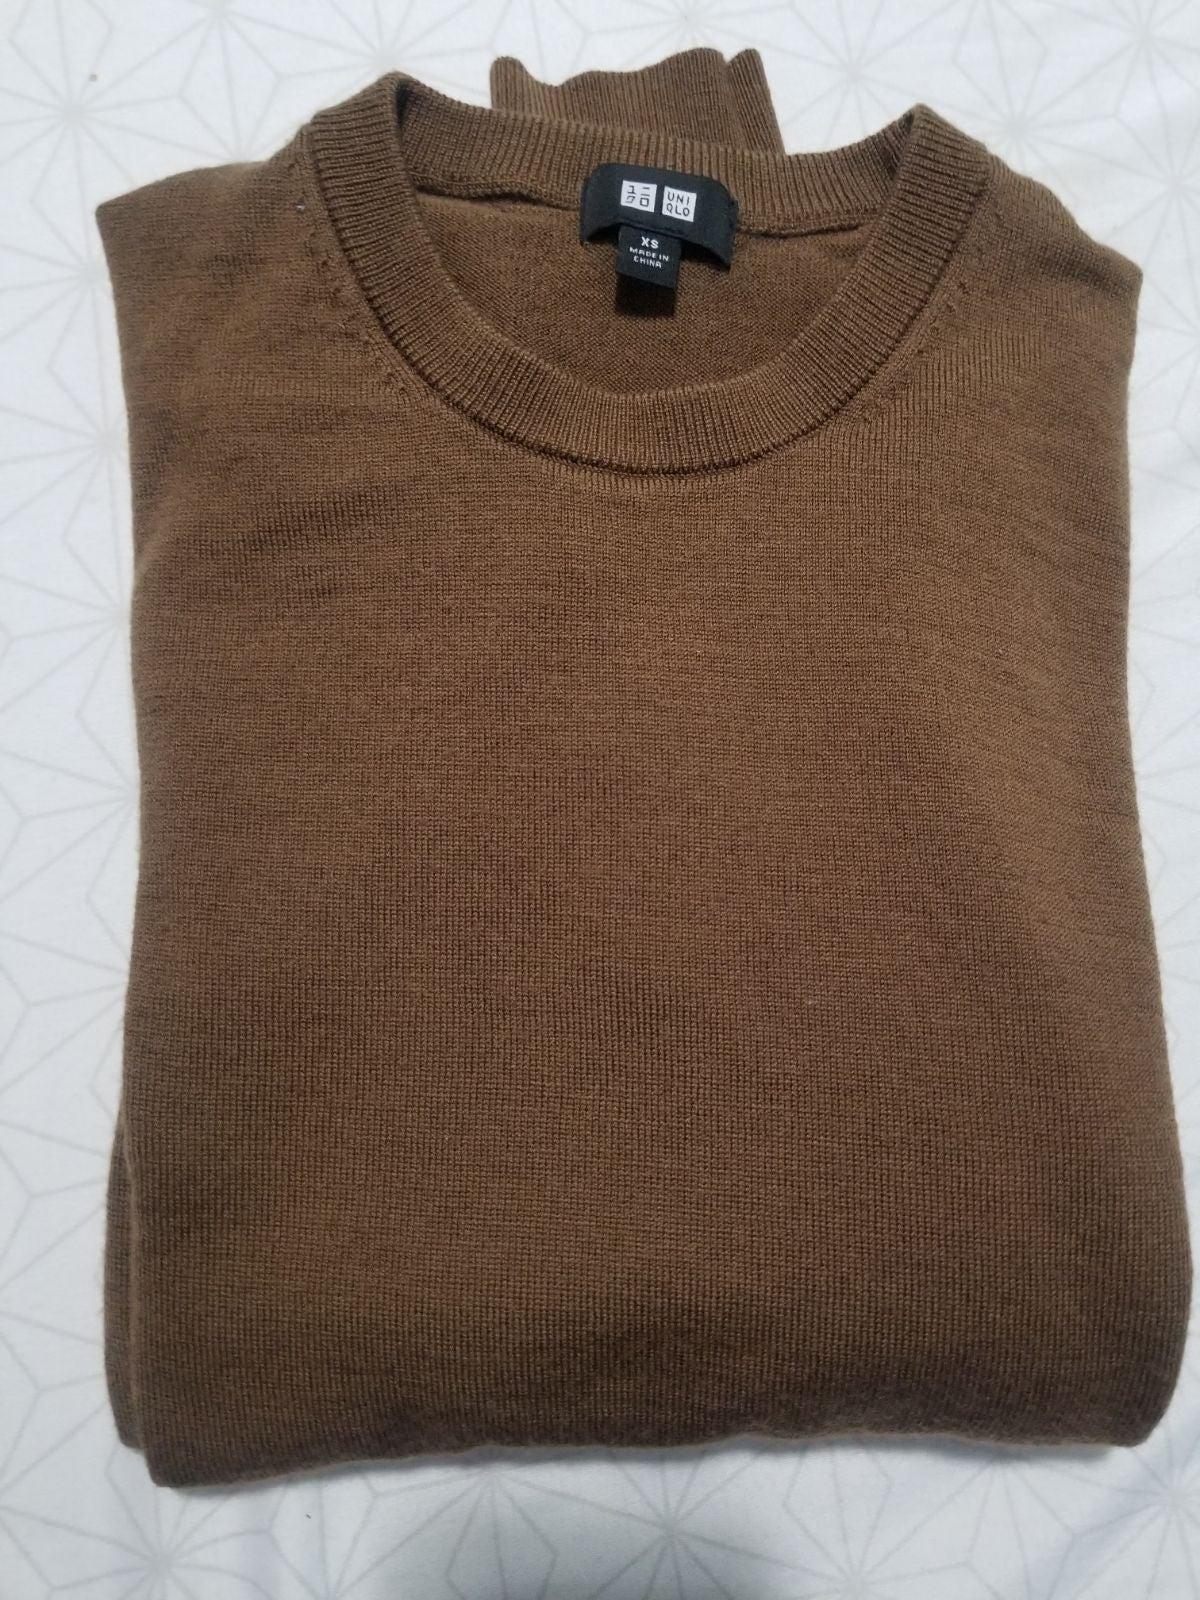 Uniqlo Wool Pullover Crewneck